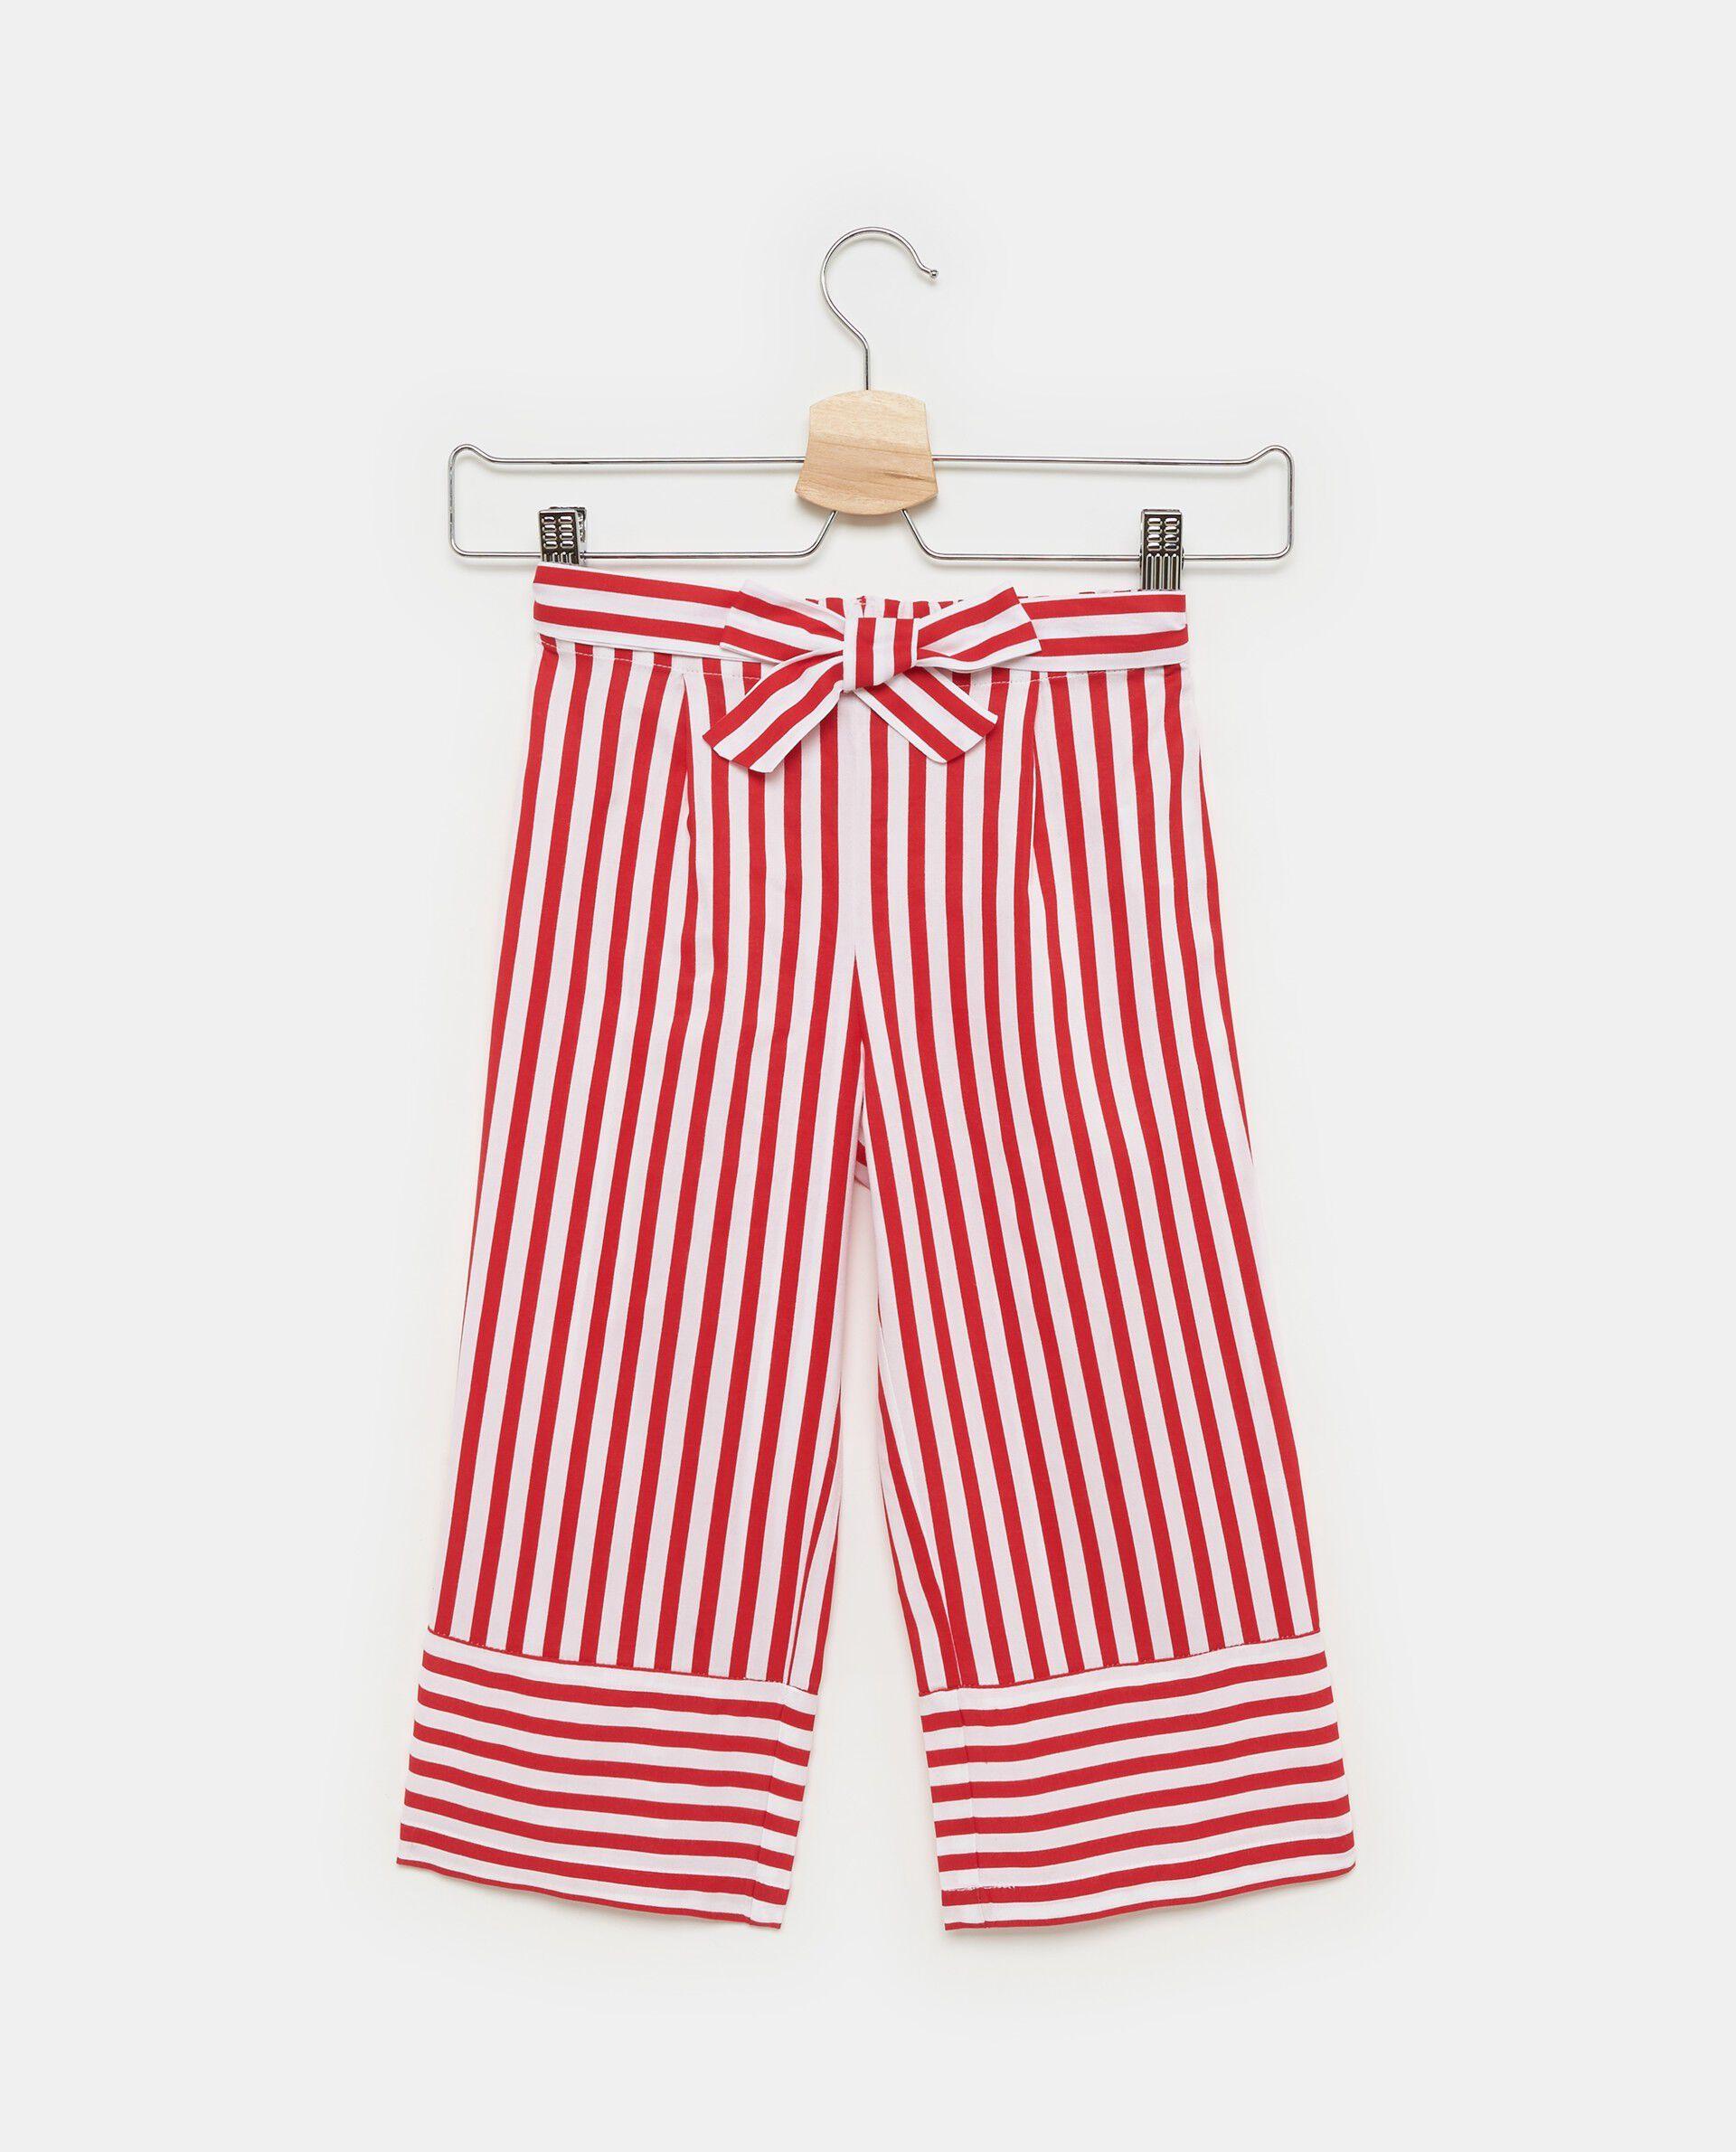 Pantaloni in pura viscosa con motivo a righe bambina